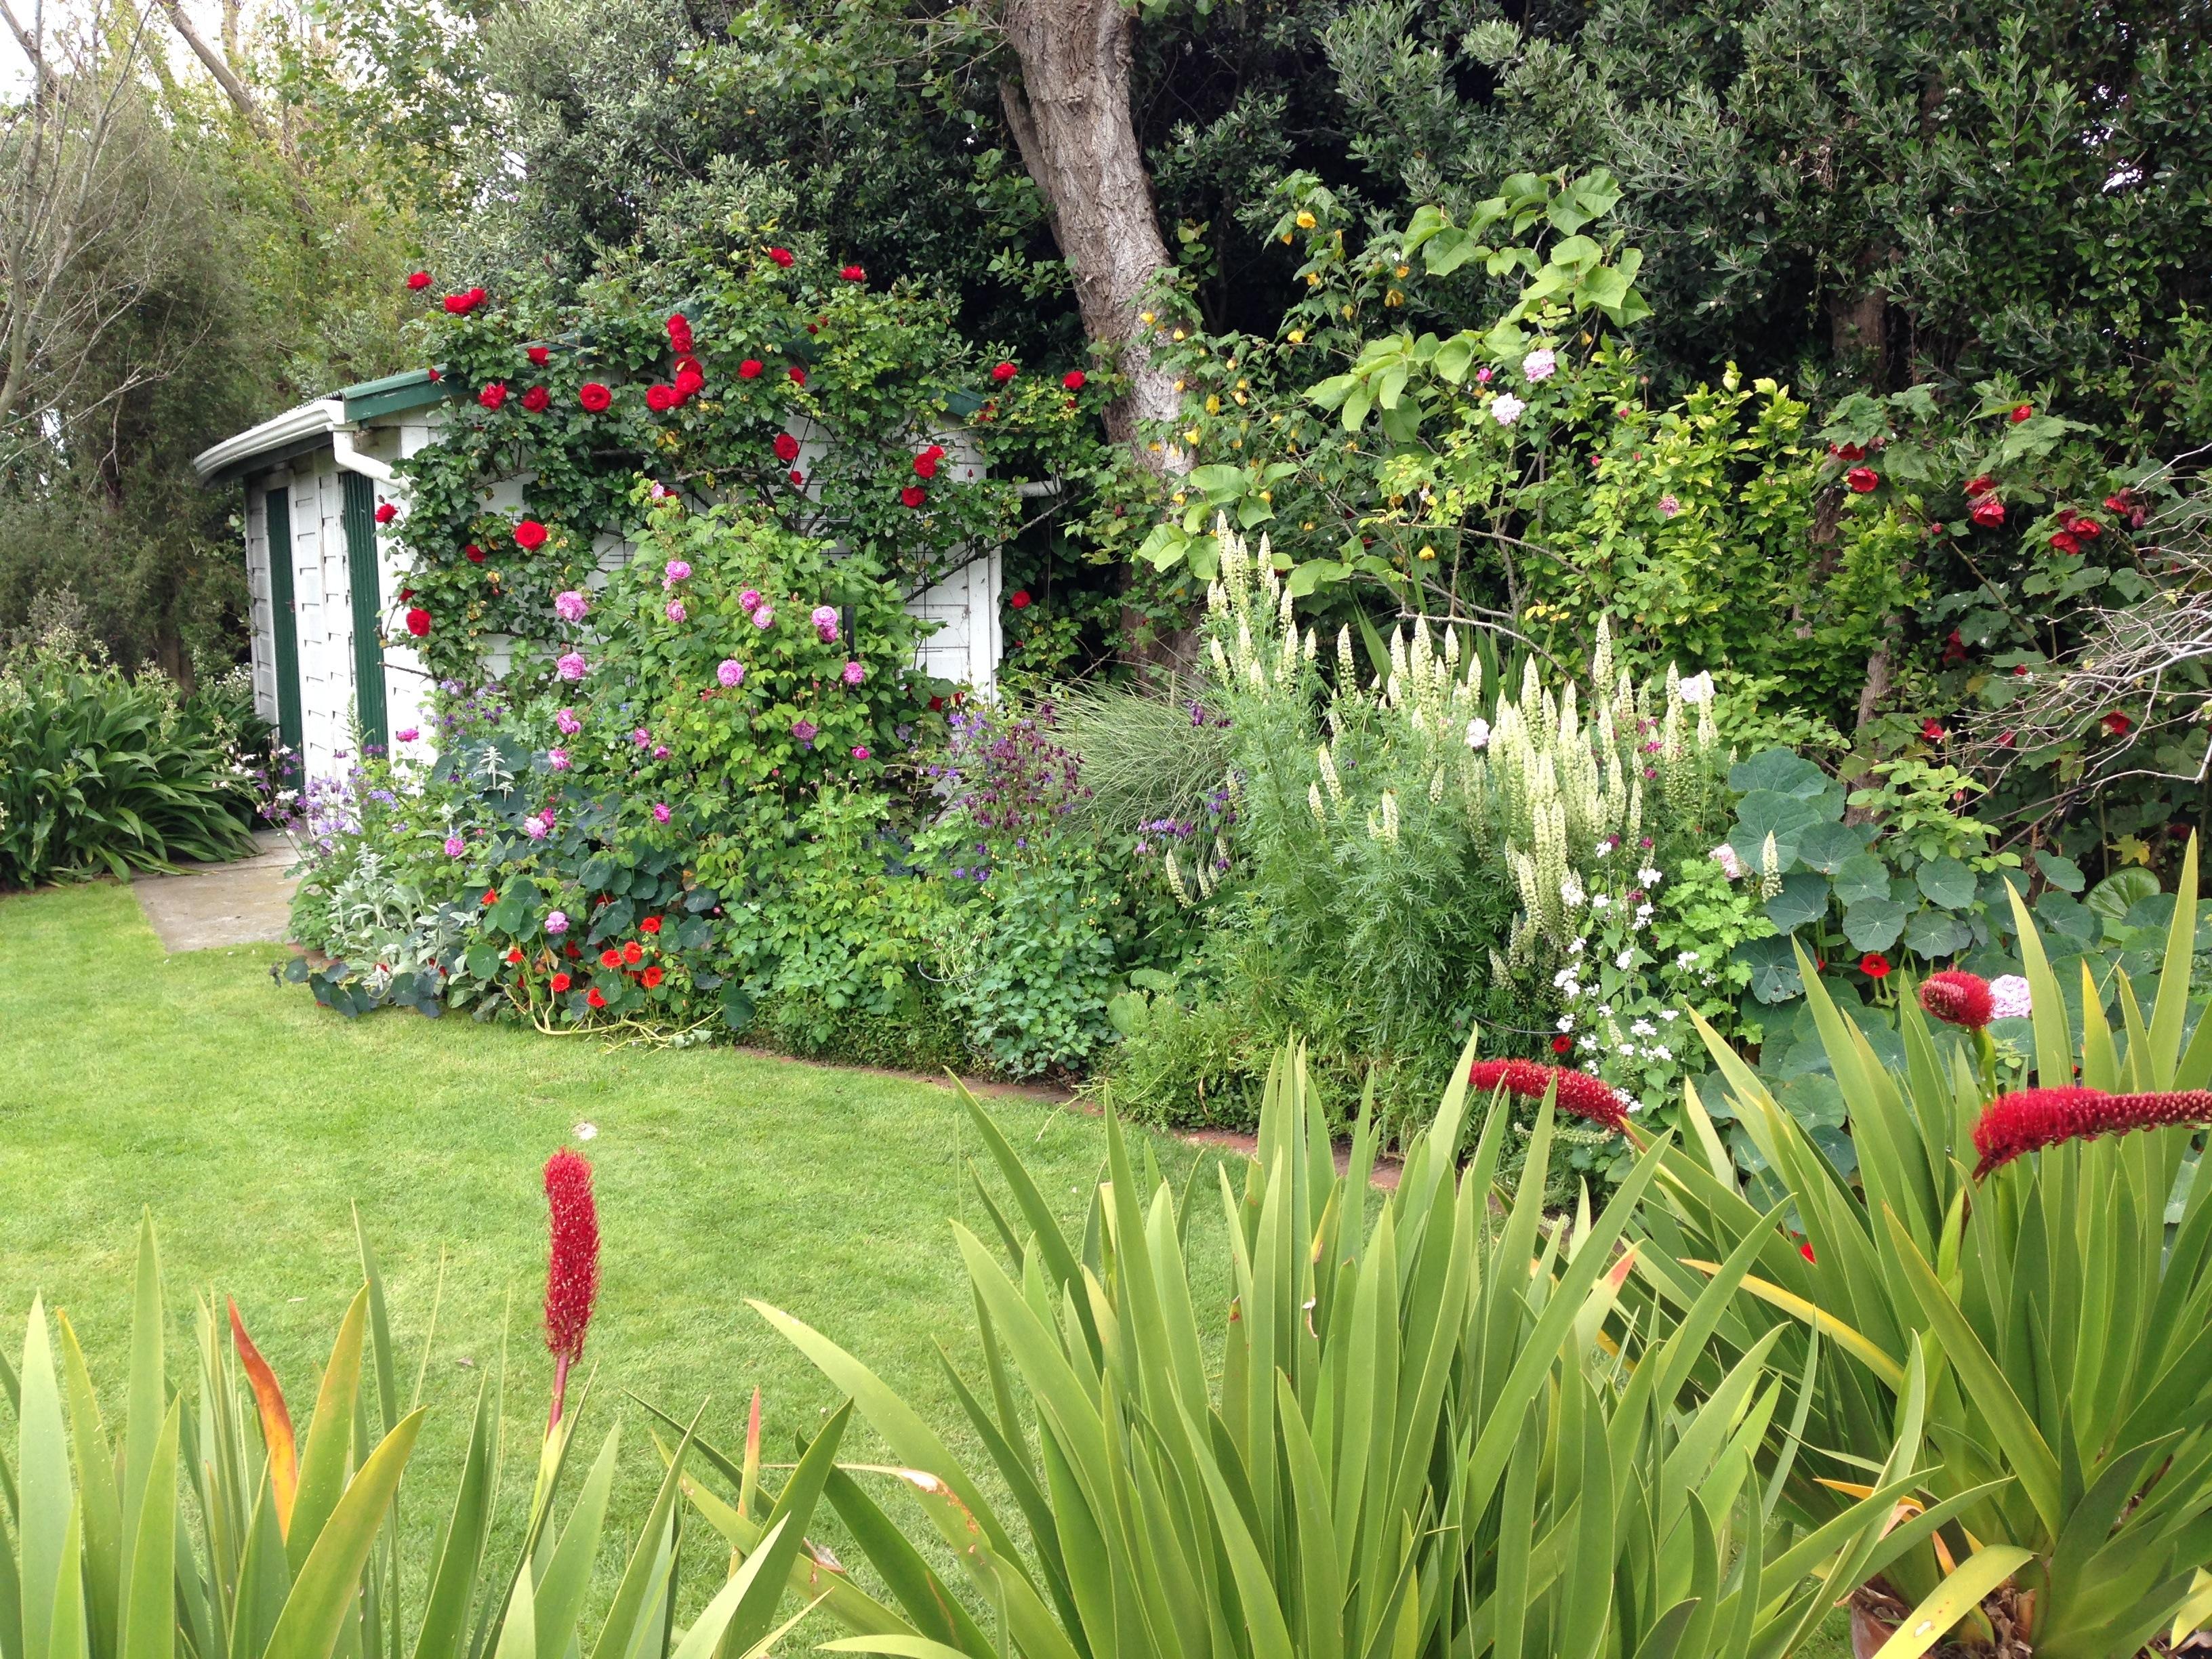 Melbourne garden show 2014 janna schreier garden design for New zealand garden designs ideas